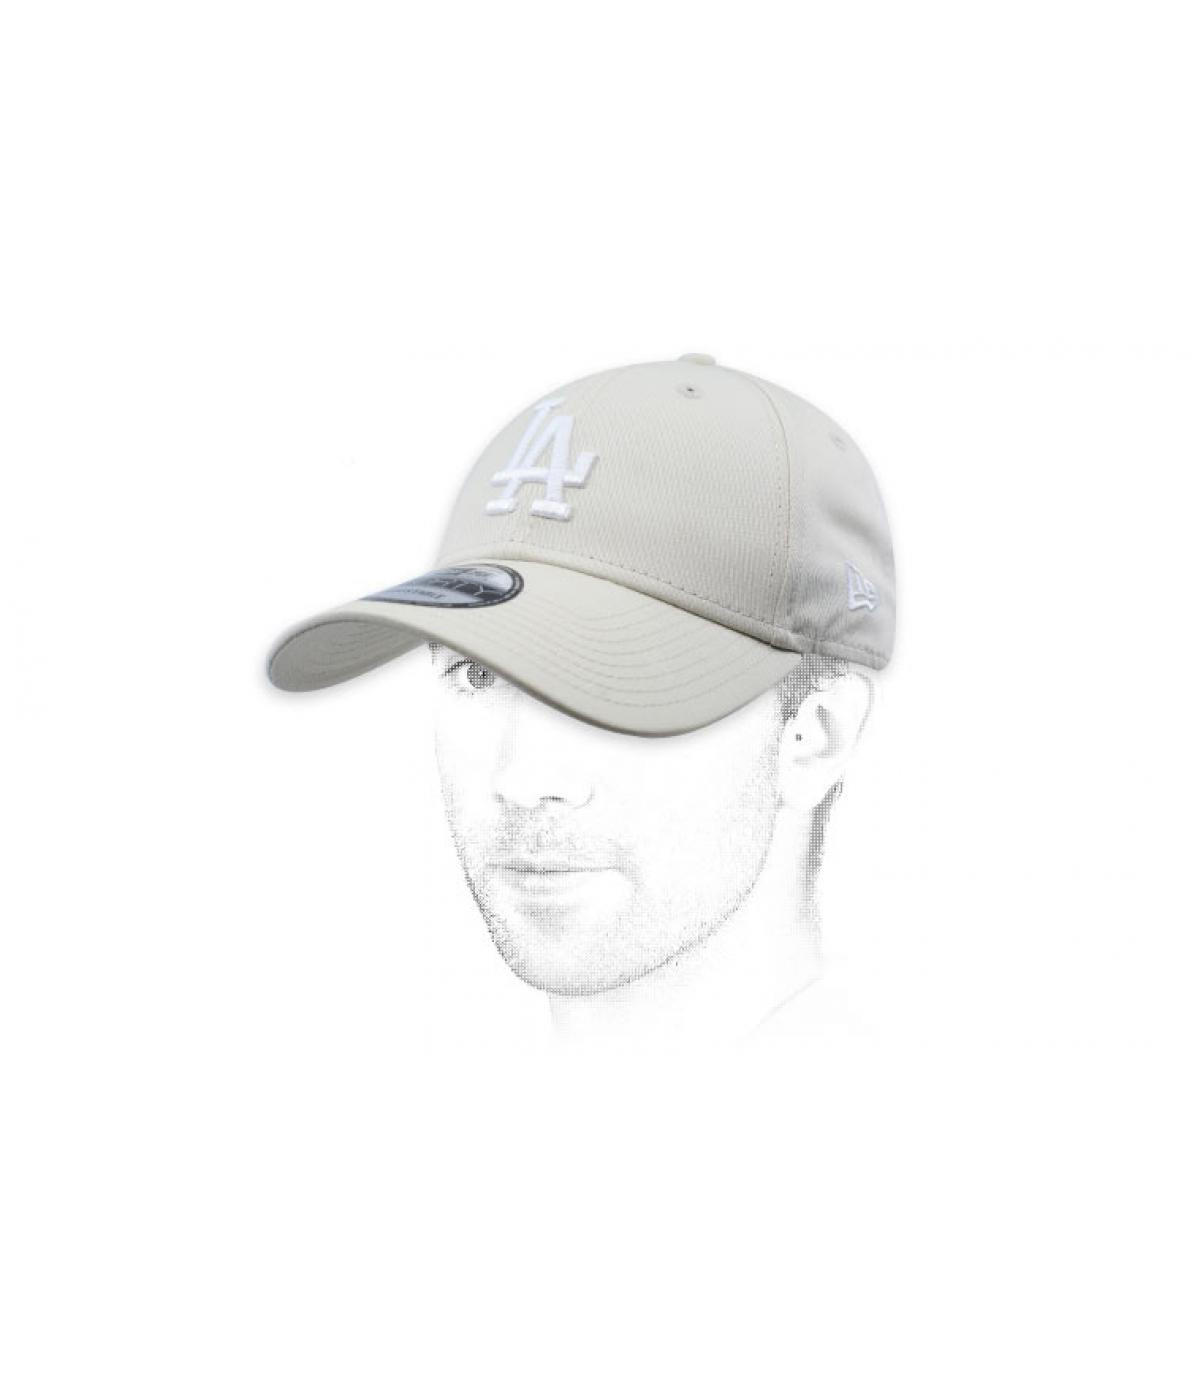 white LA cap